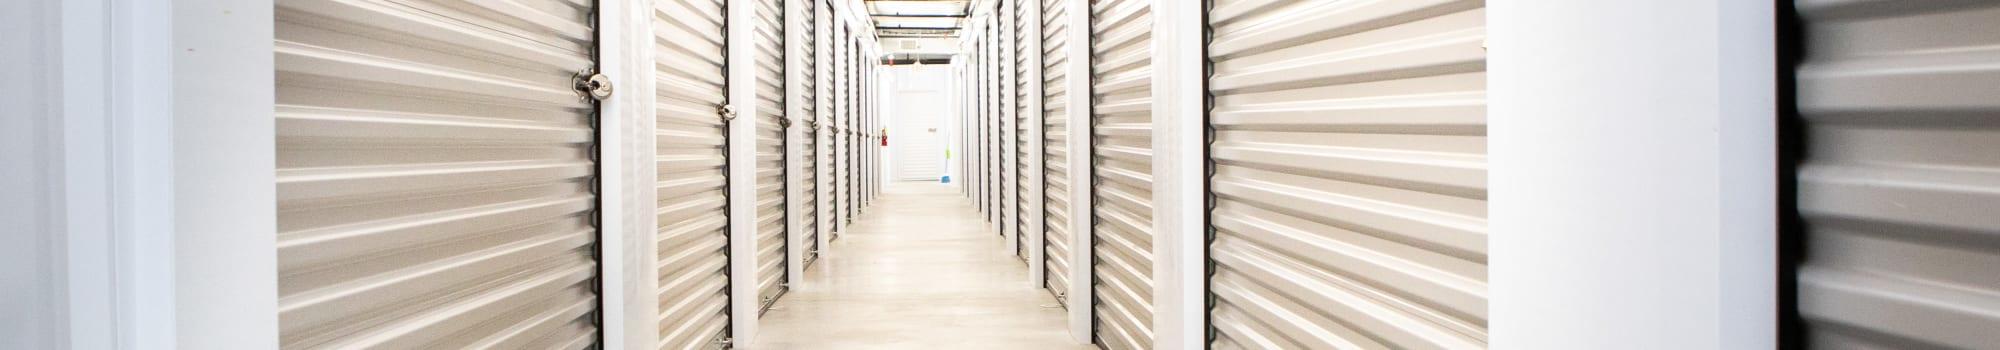 Storage supplies and tips at AAA Self Storage in Greensboro, North Carolina